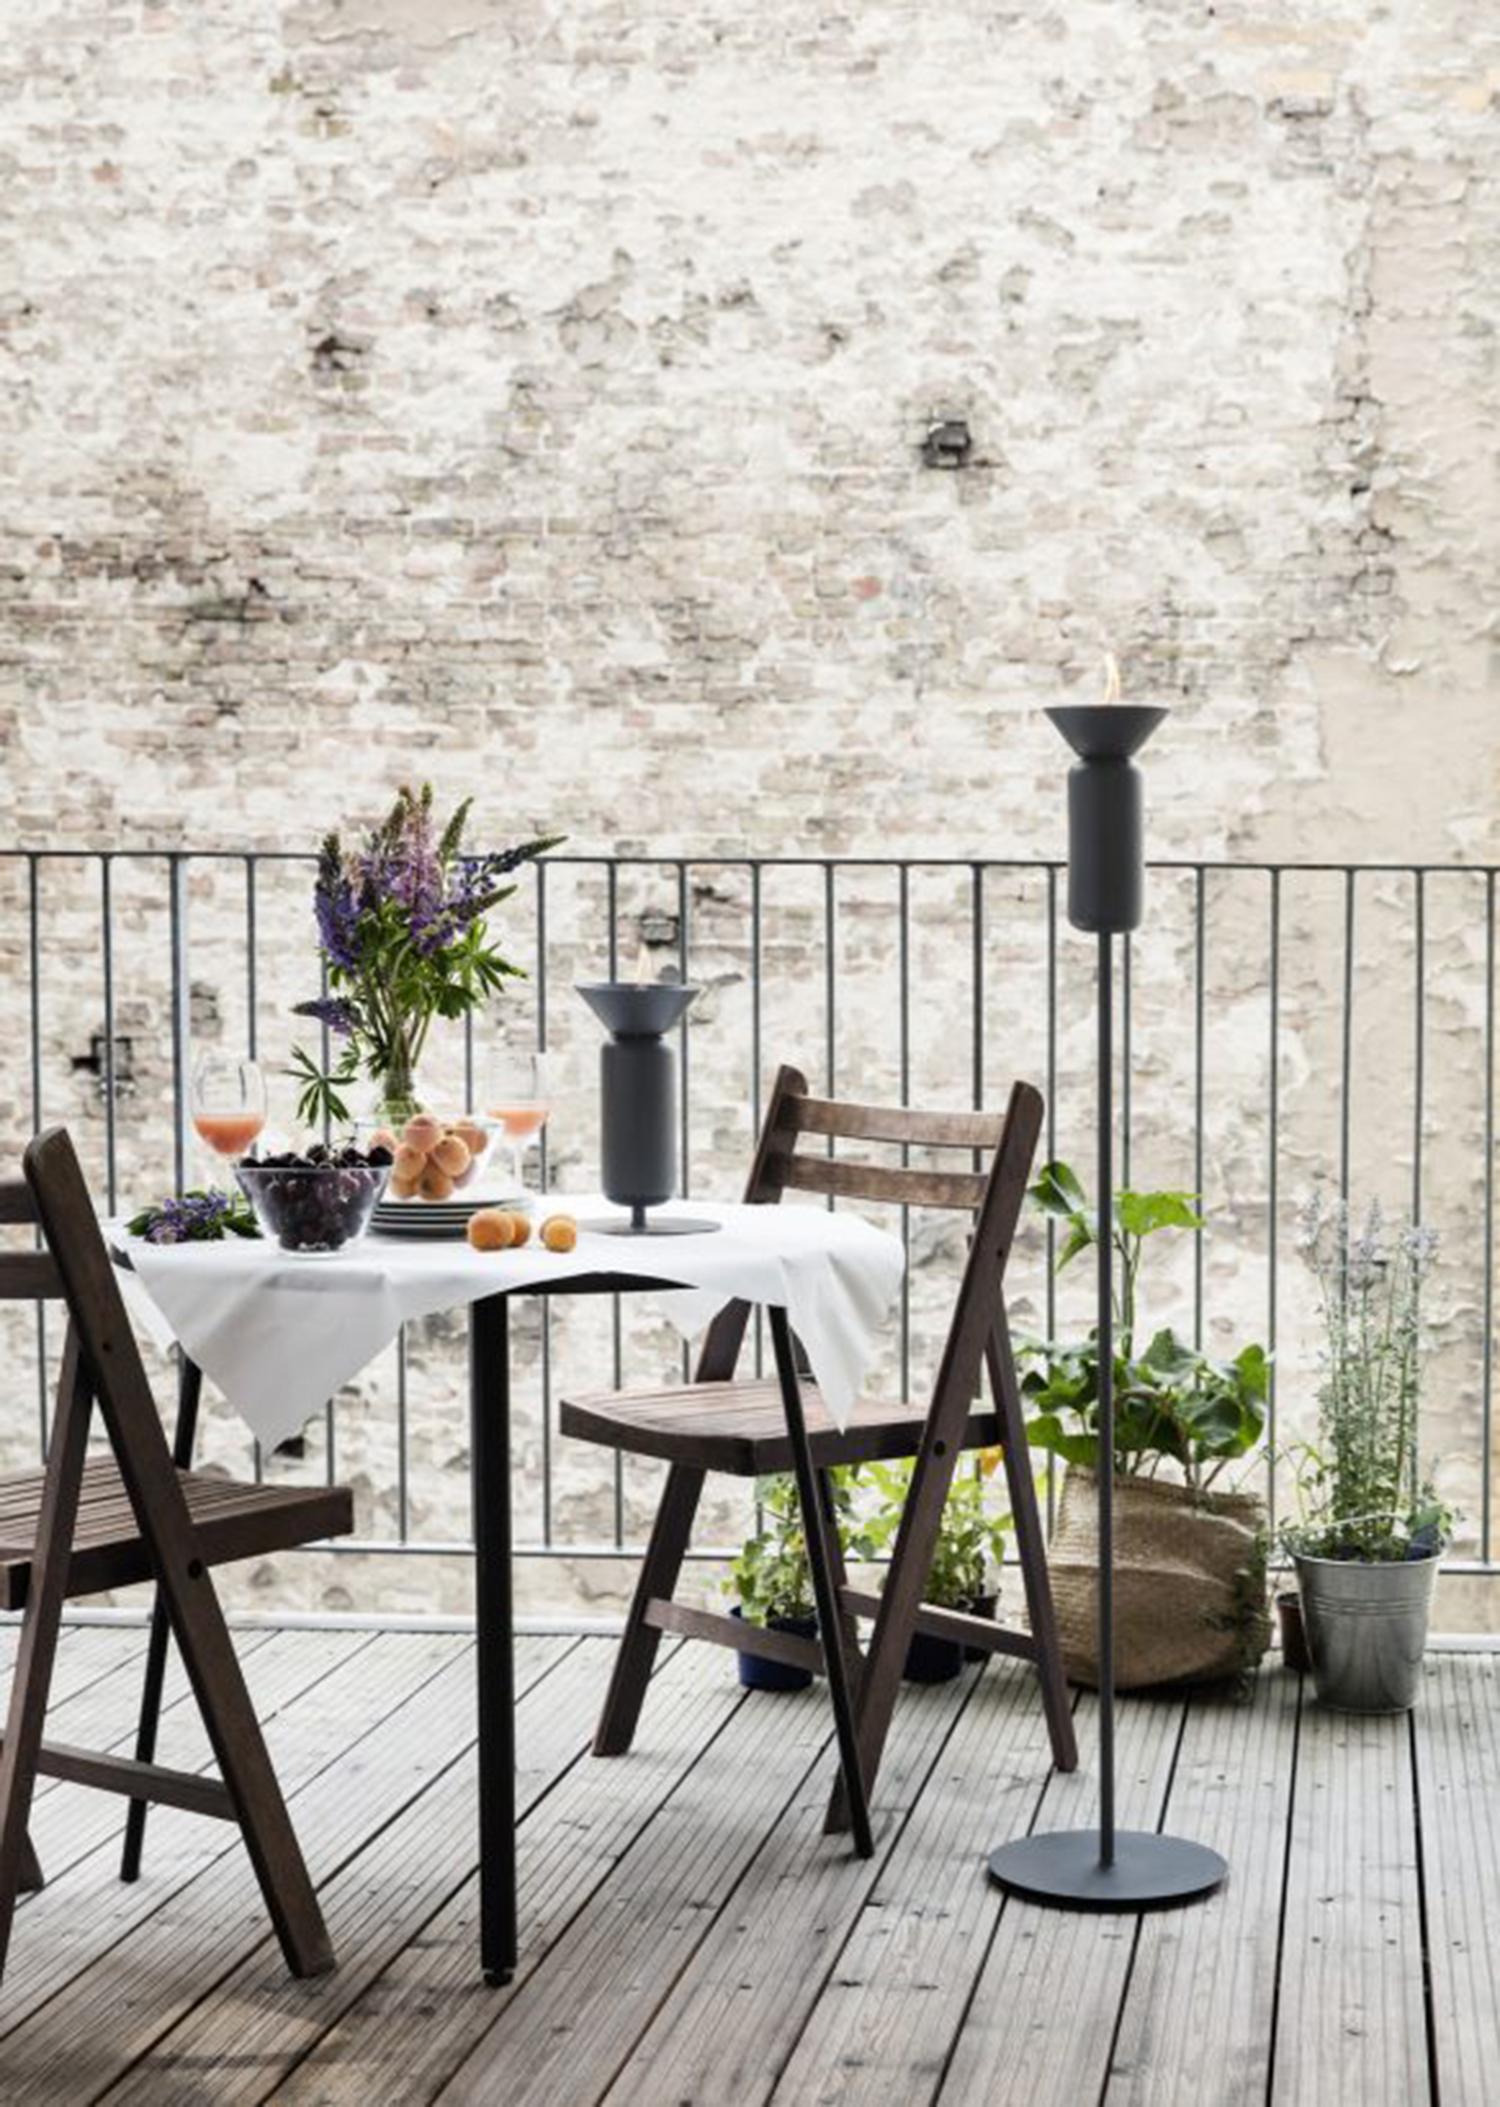 Poppy_Black-grey_skinny_table_and_long_balcony-Low_res_Photo-Chris_Tonnesen-583x819.jpg